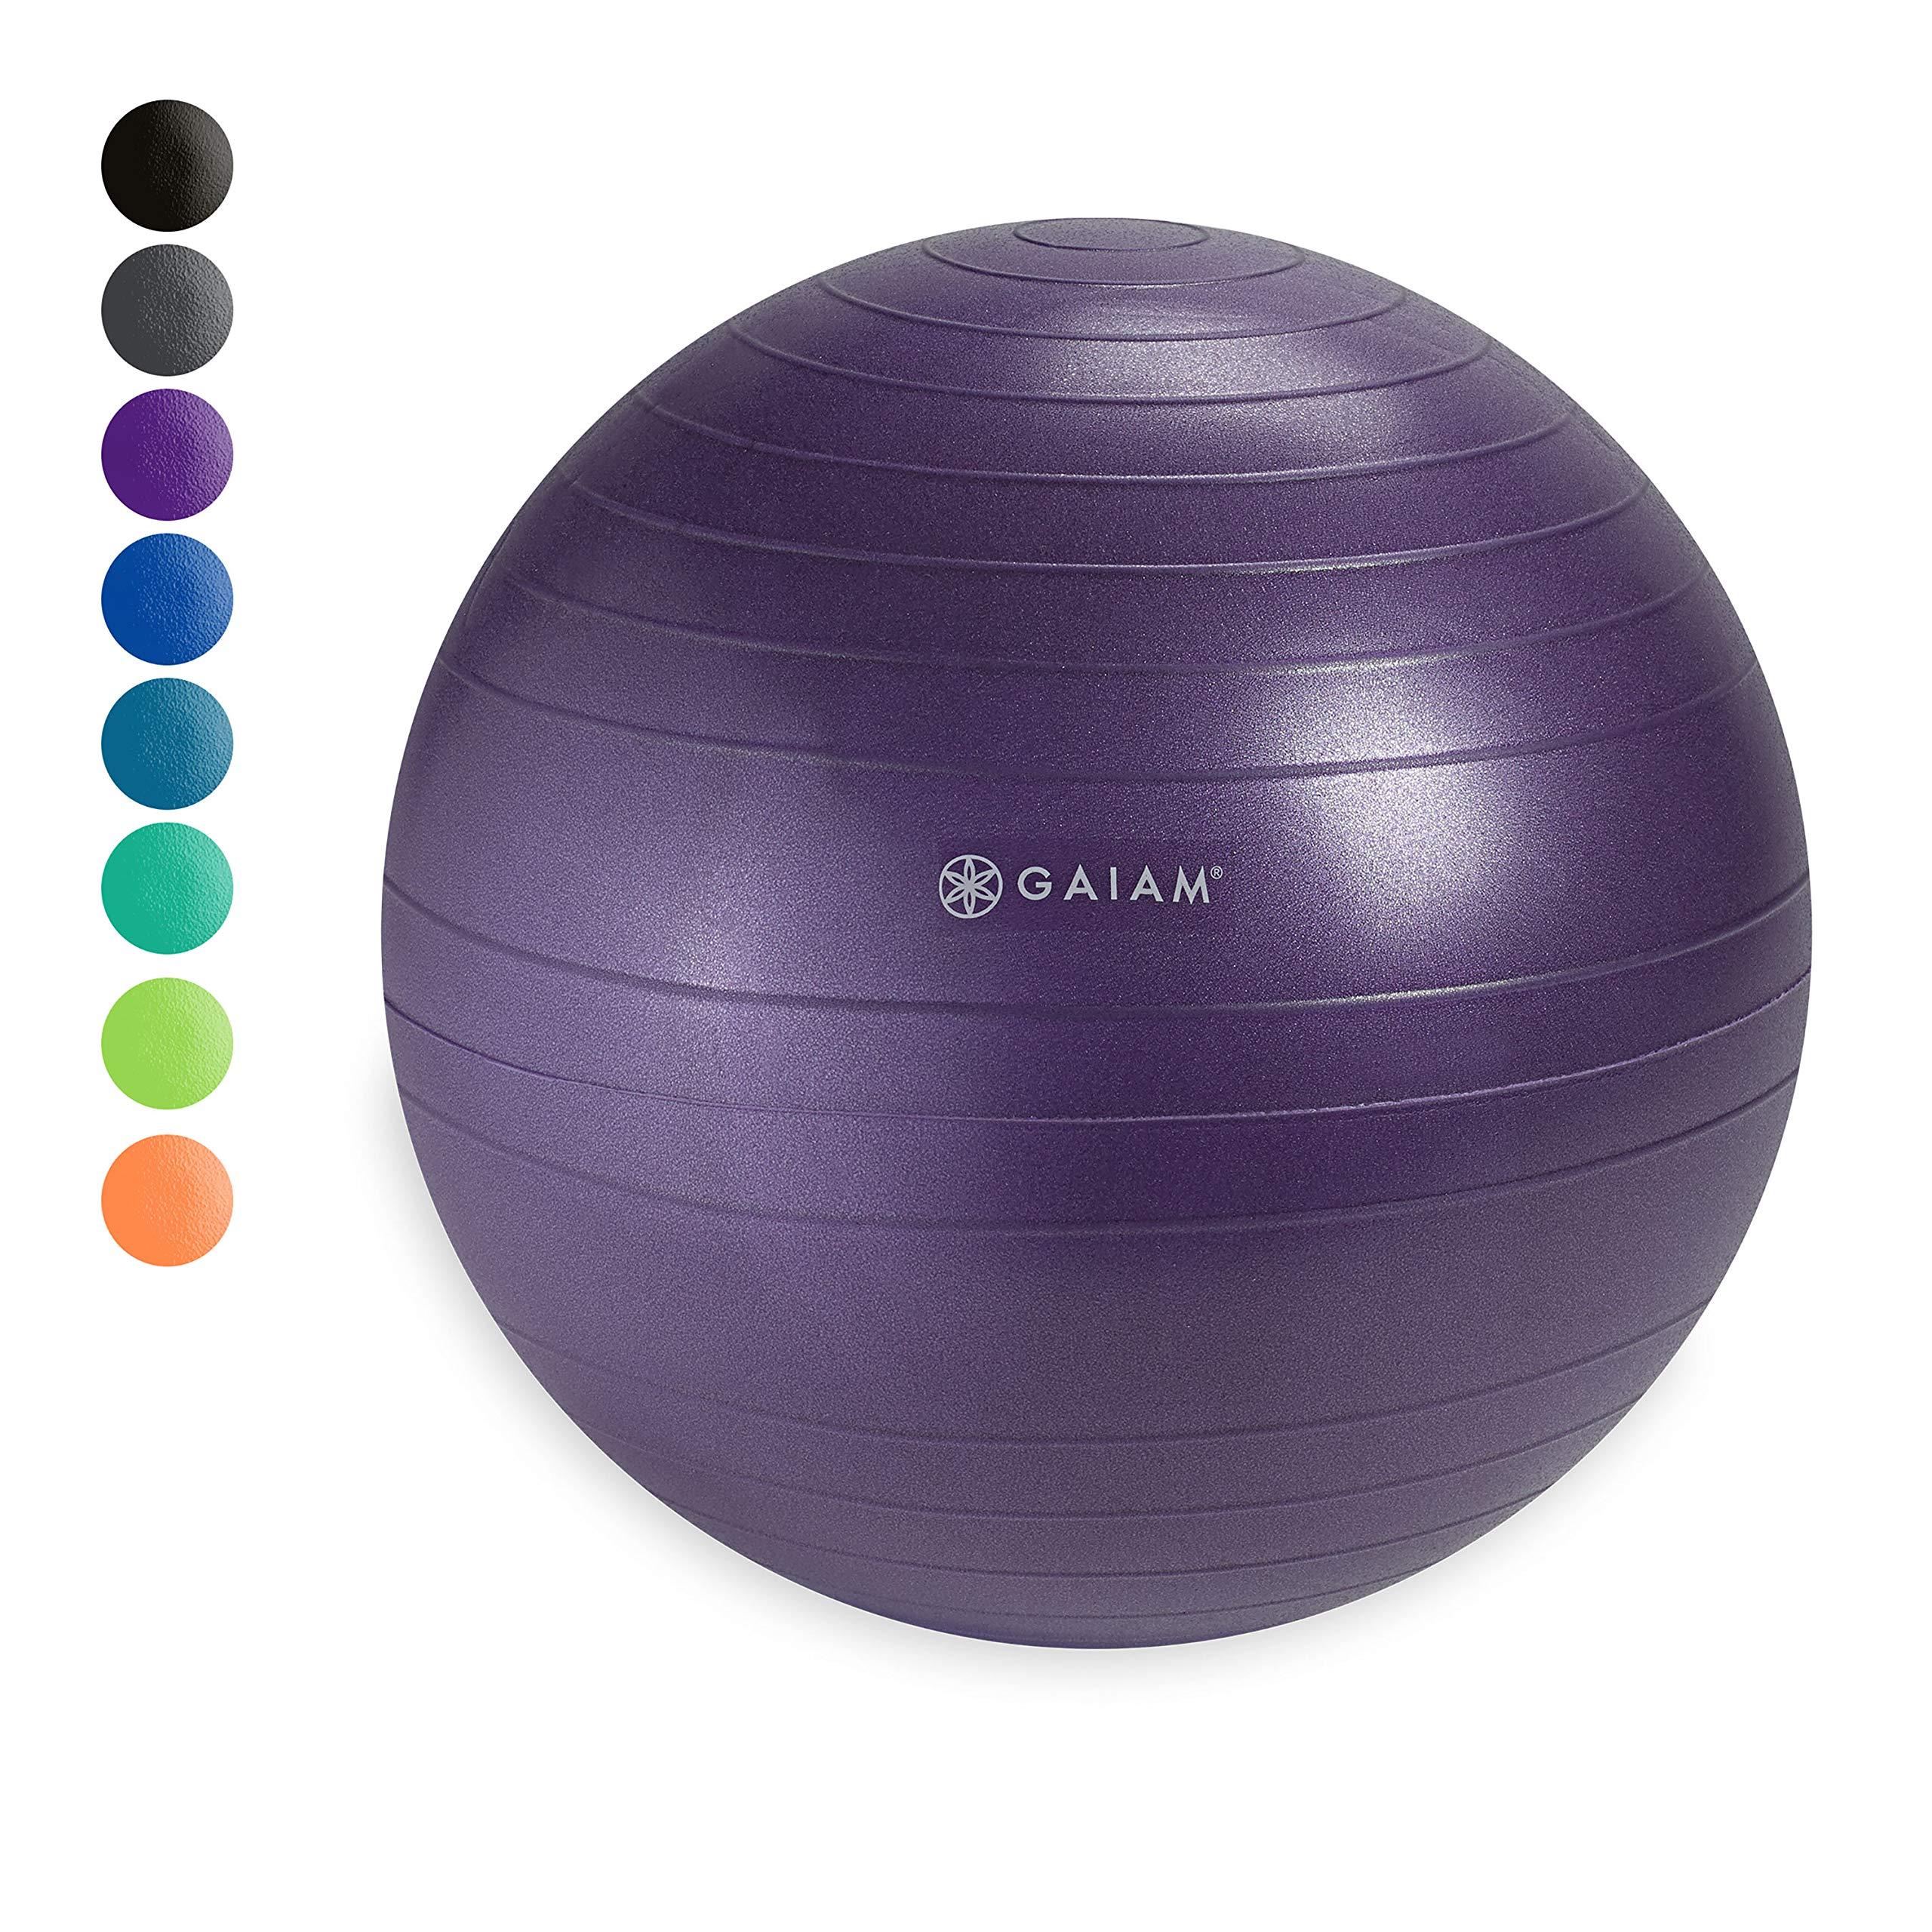 Gaiam Classic Balance Ball Chair Ball - Extra 52cm Balance Ball for Classic Balance Ball Chairs, Purple